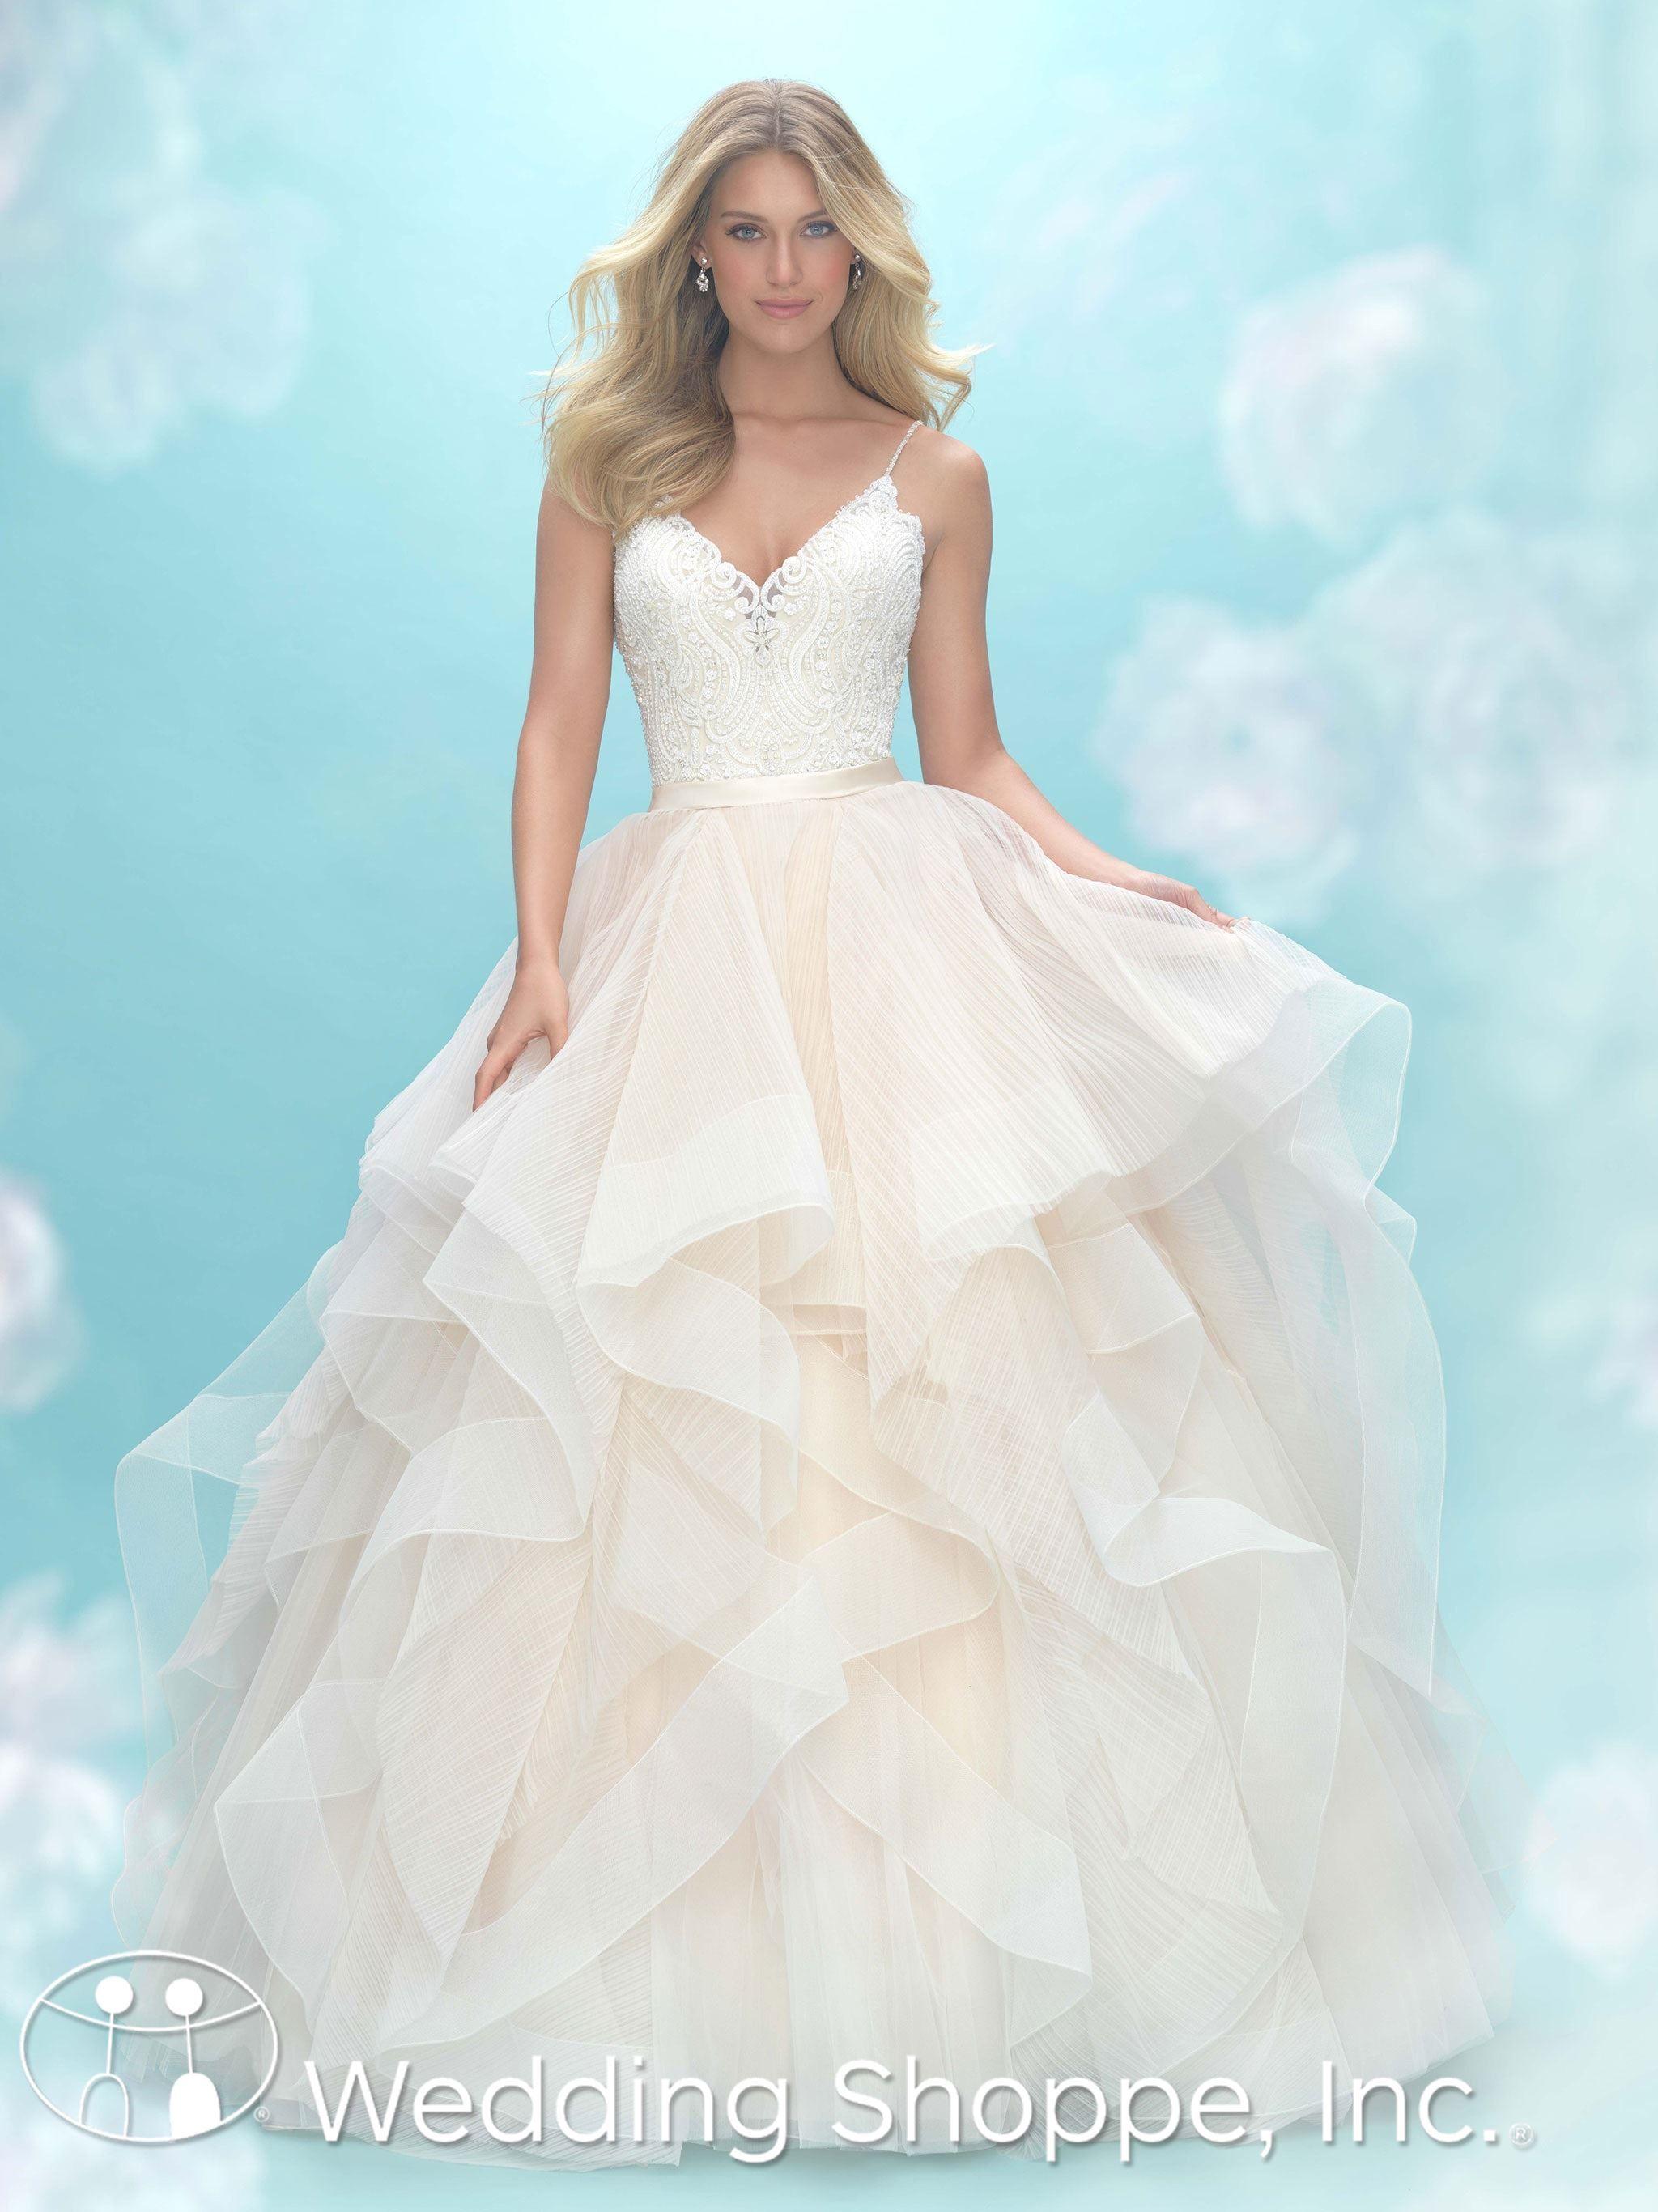 Schön Bridesmaid Dresses Calgary Fotos - Brautkleider Ideen ...